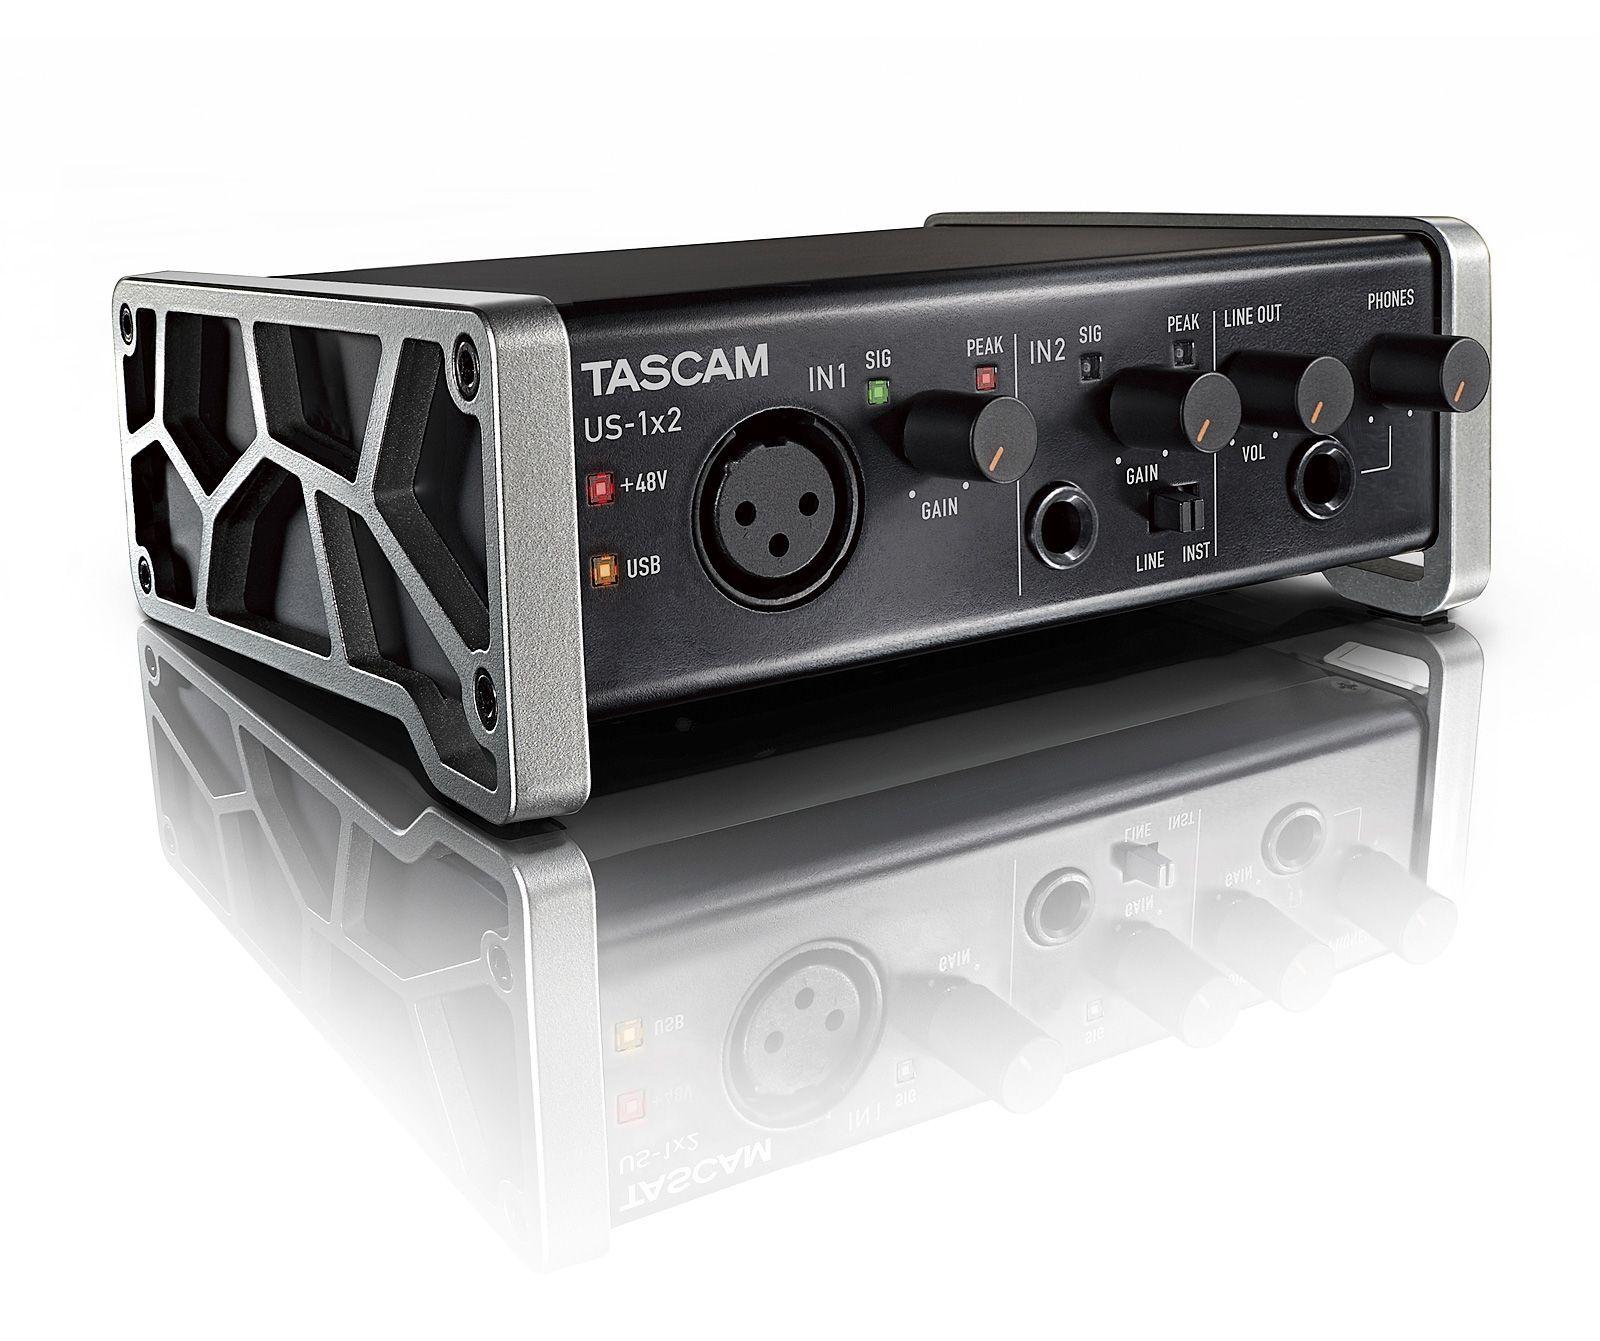 Tascam US-1x2 USB Audio Interface 2-Kanal mit 1 Mikrofon- und 1 Line-Eingang